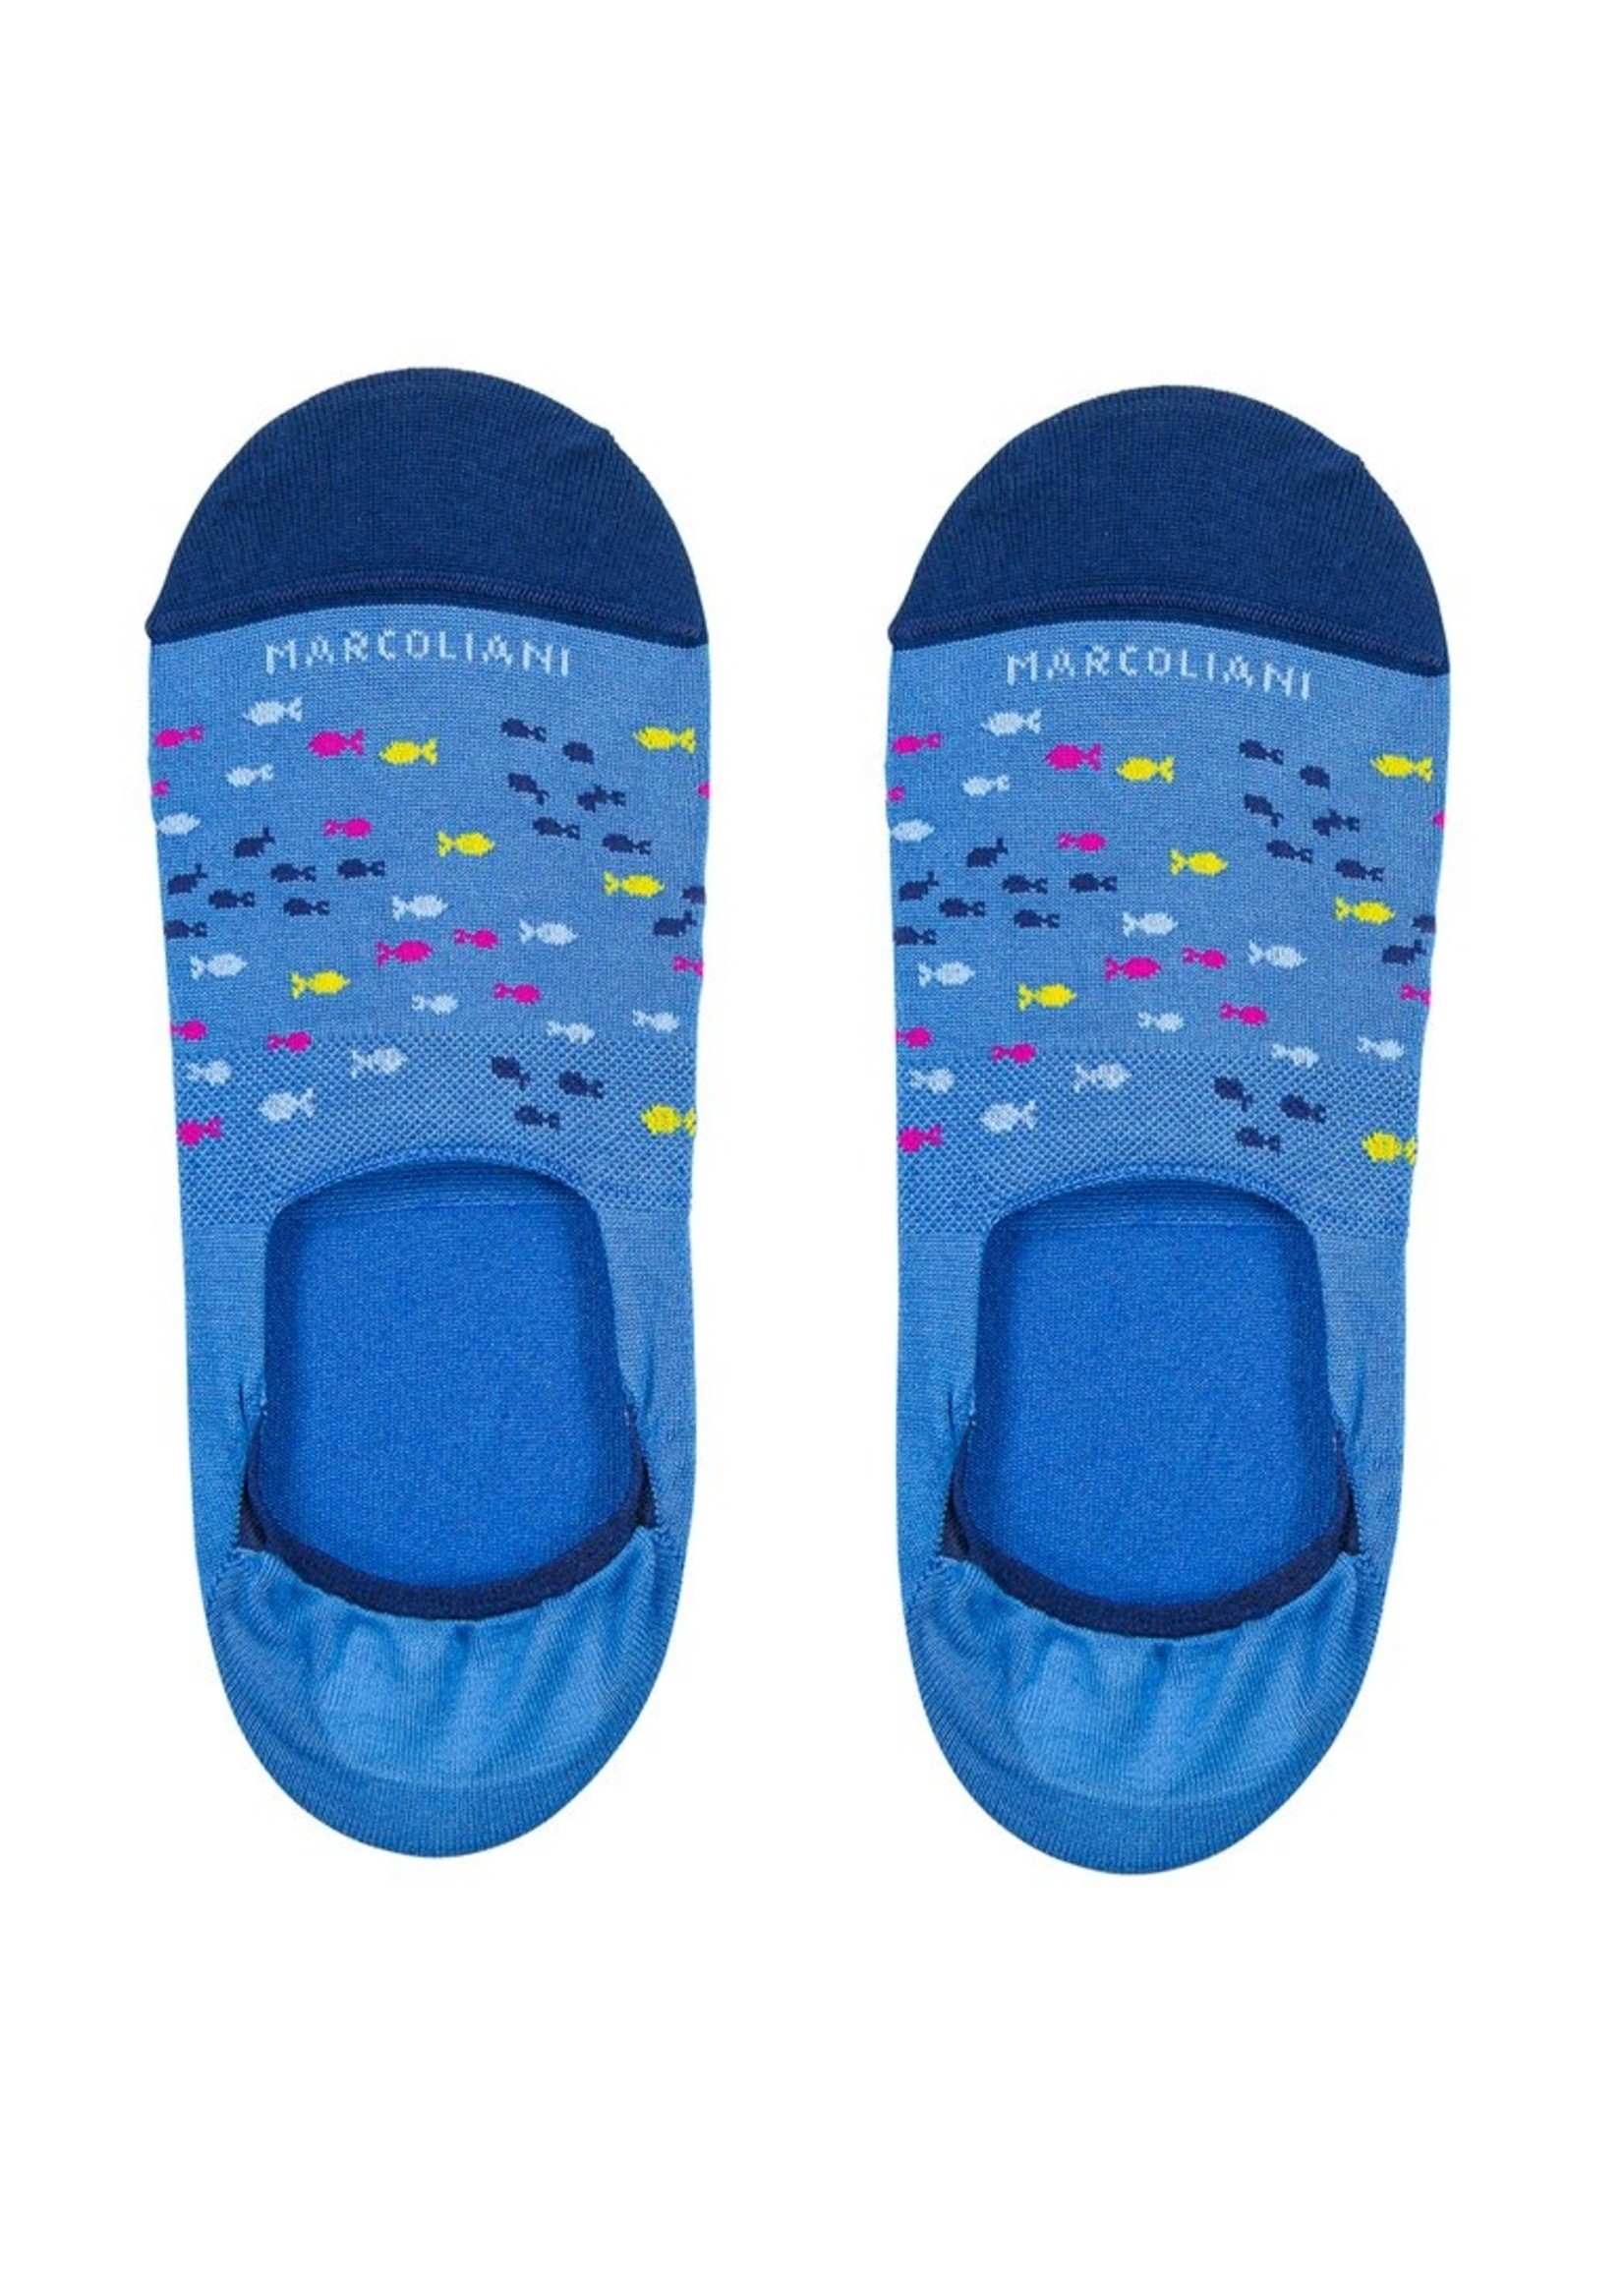 Marcoliani Marcoliani No Show Socks - Original 081 Royal Blue